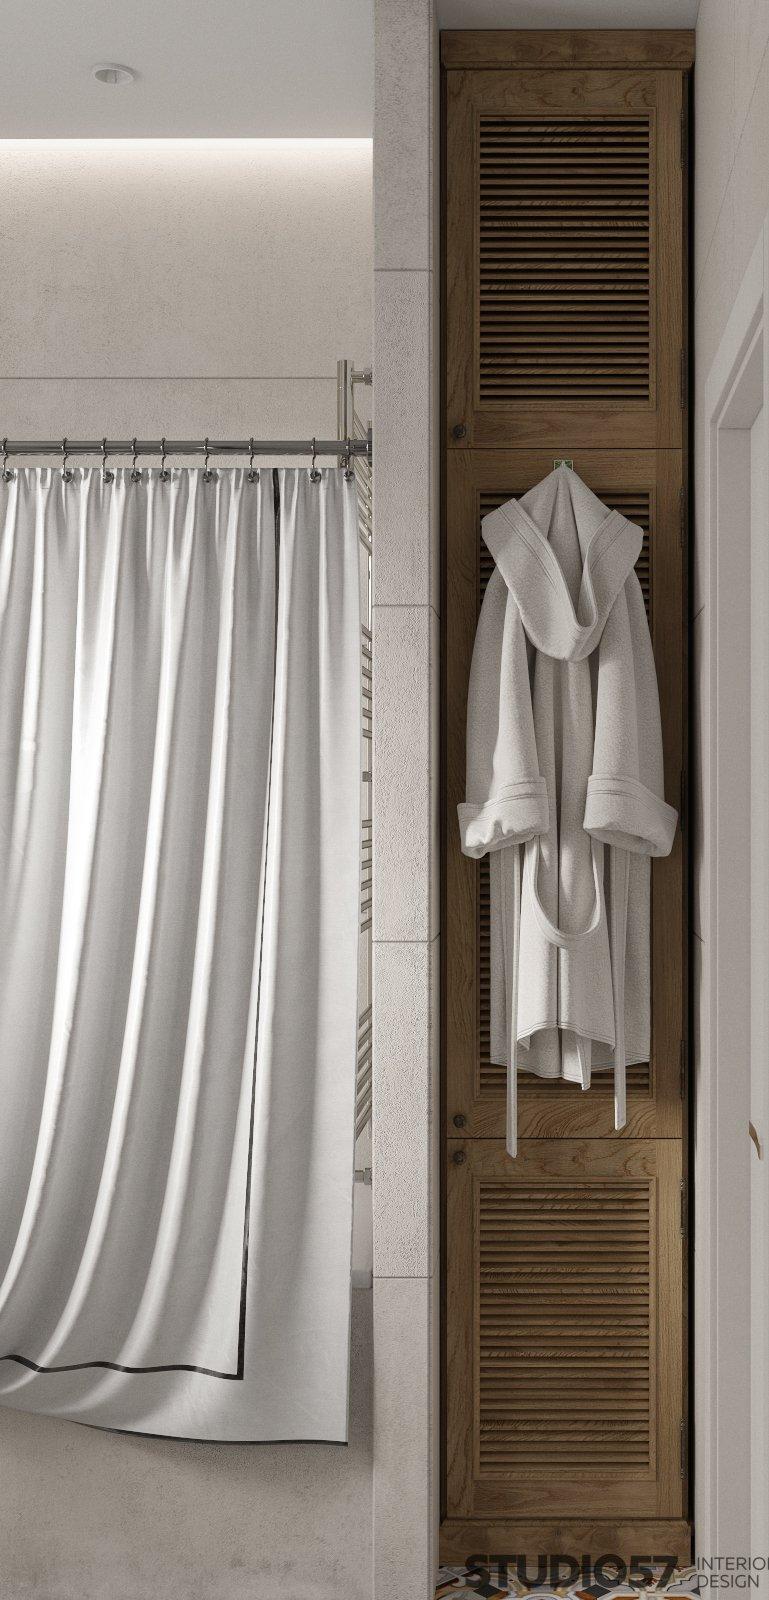 Bathroom Interior in Contemporary Style Picture